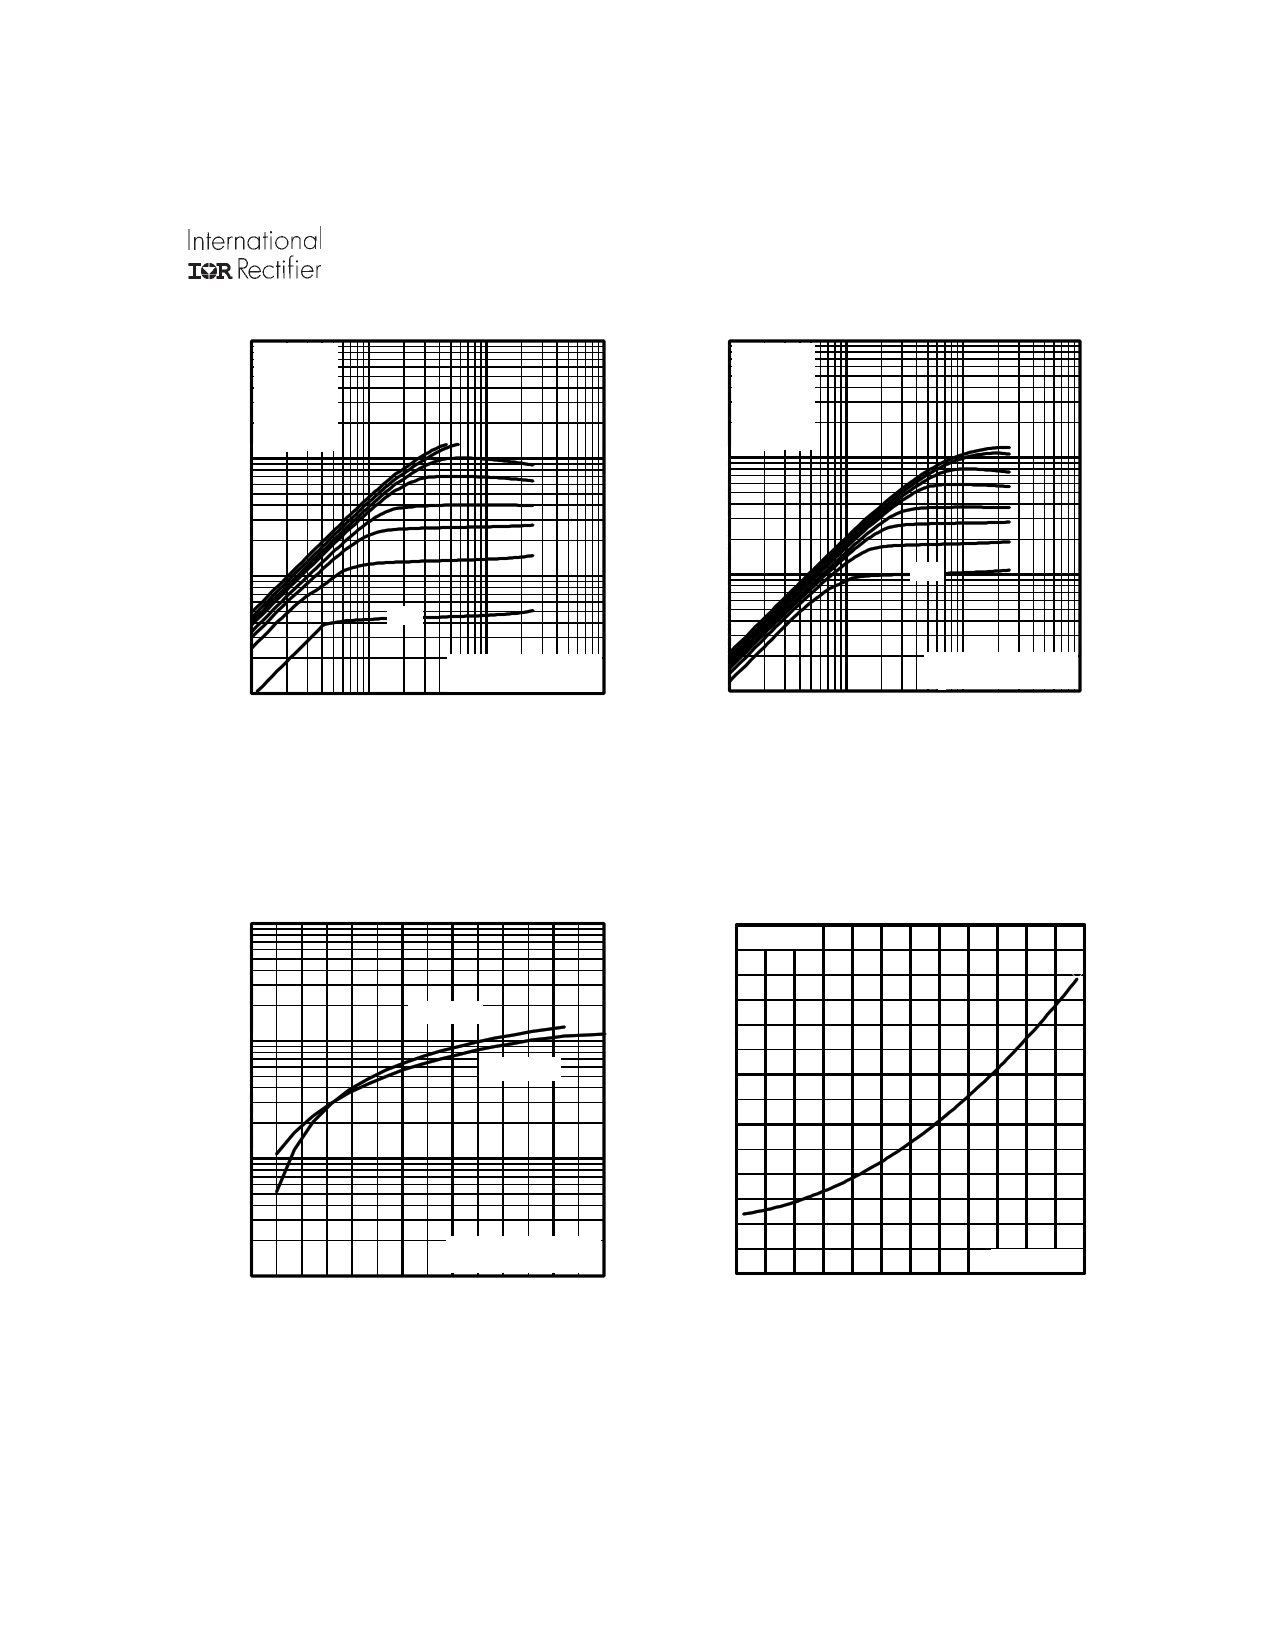 IRFZ34VSPBF pdf, ピン配列